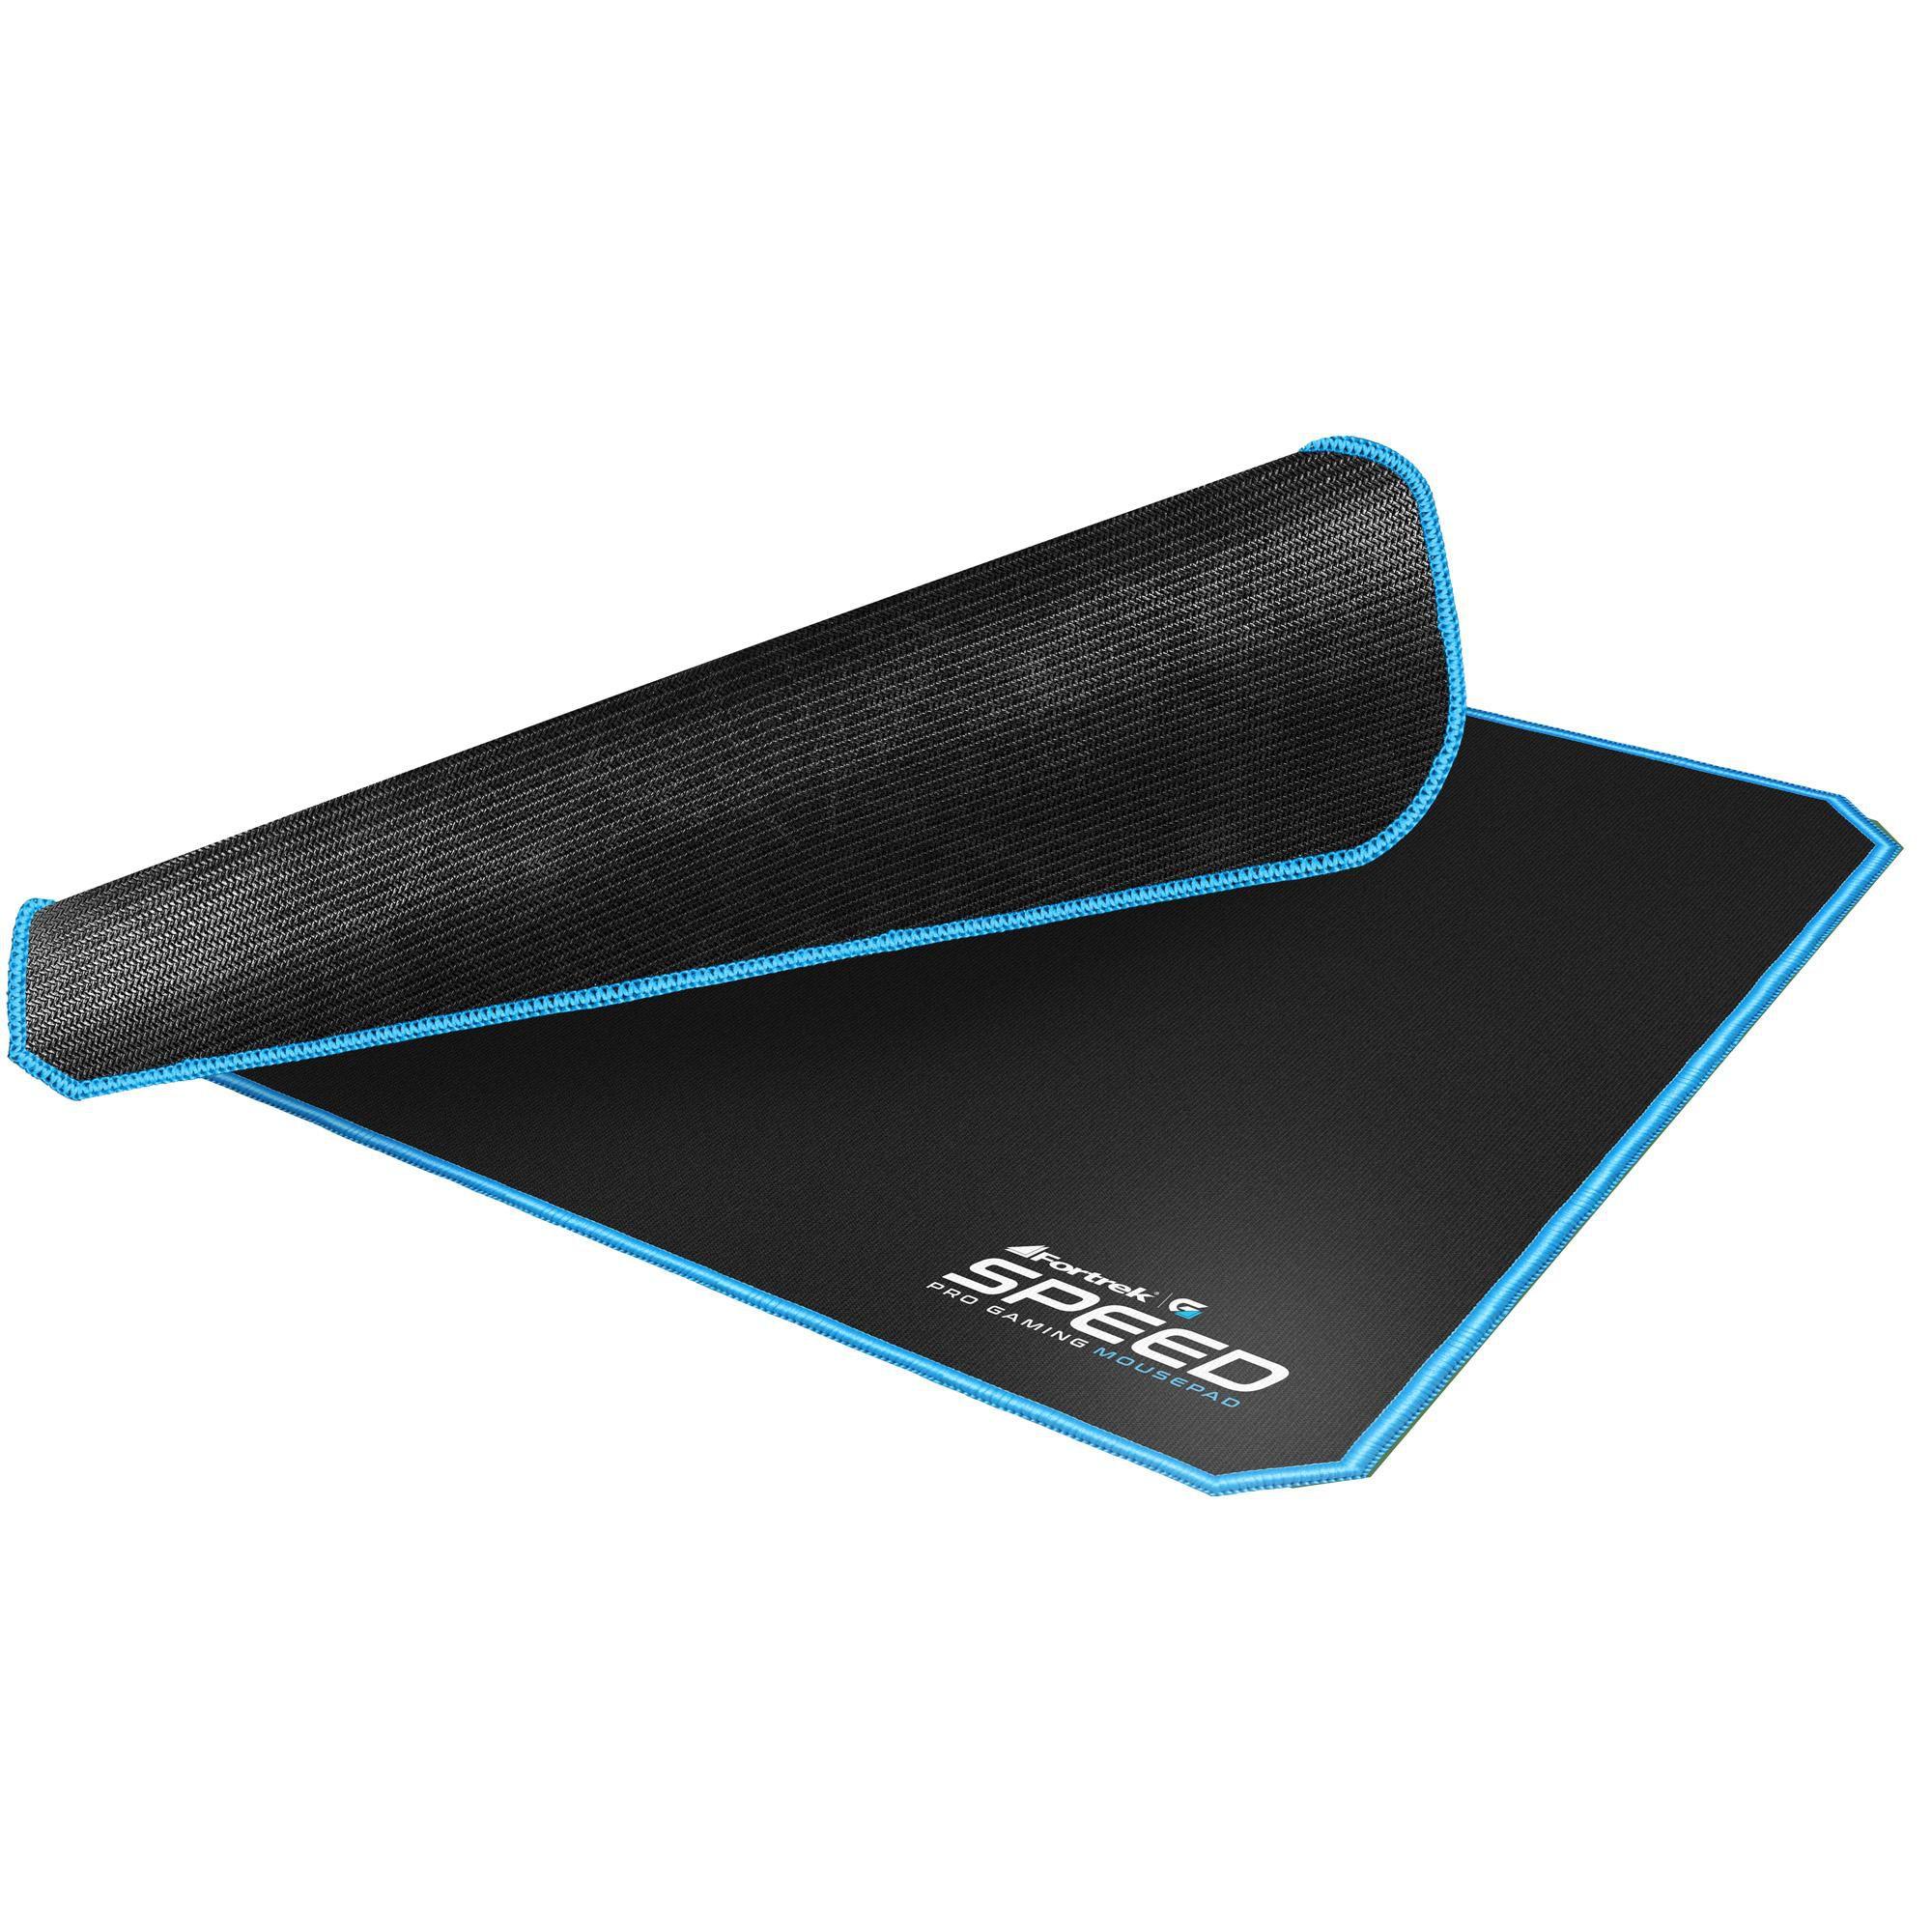 Mouse Pad Gamer FORTREK SPEED Preto - MPG101